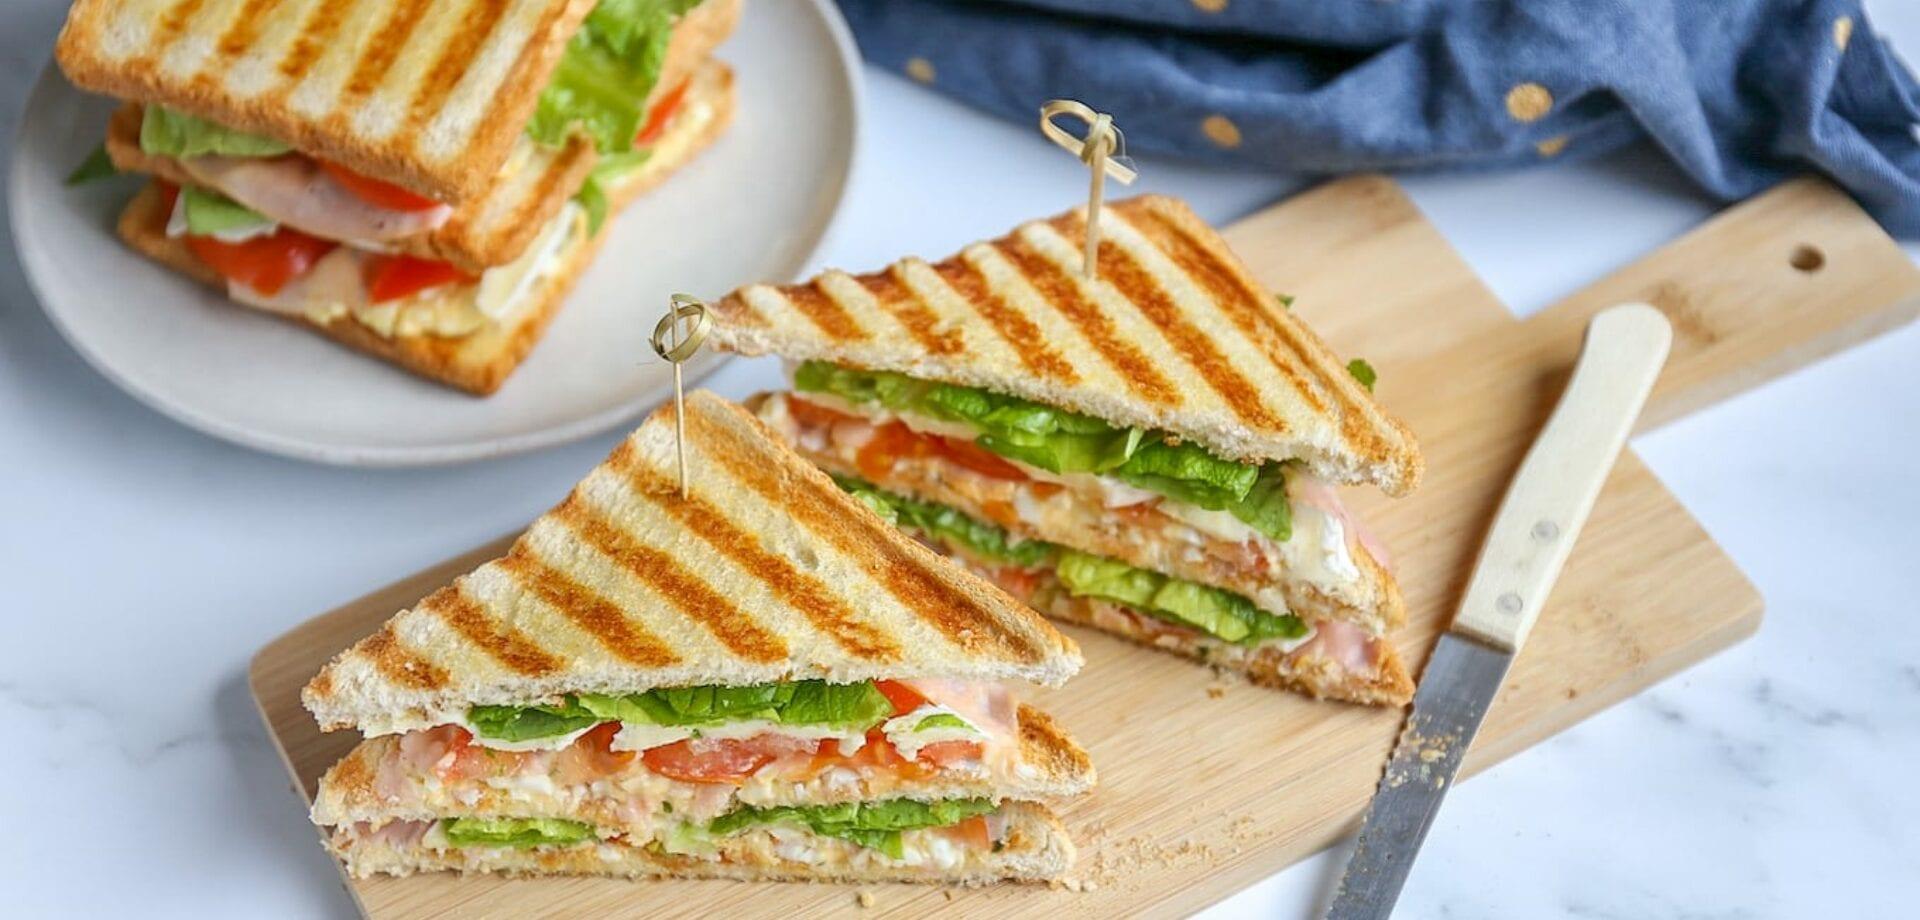 clubsandwich met brie